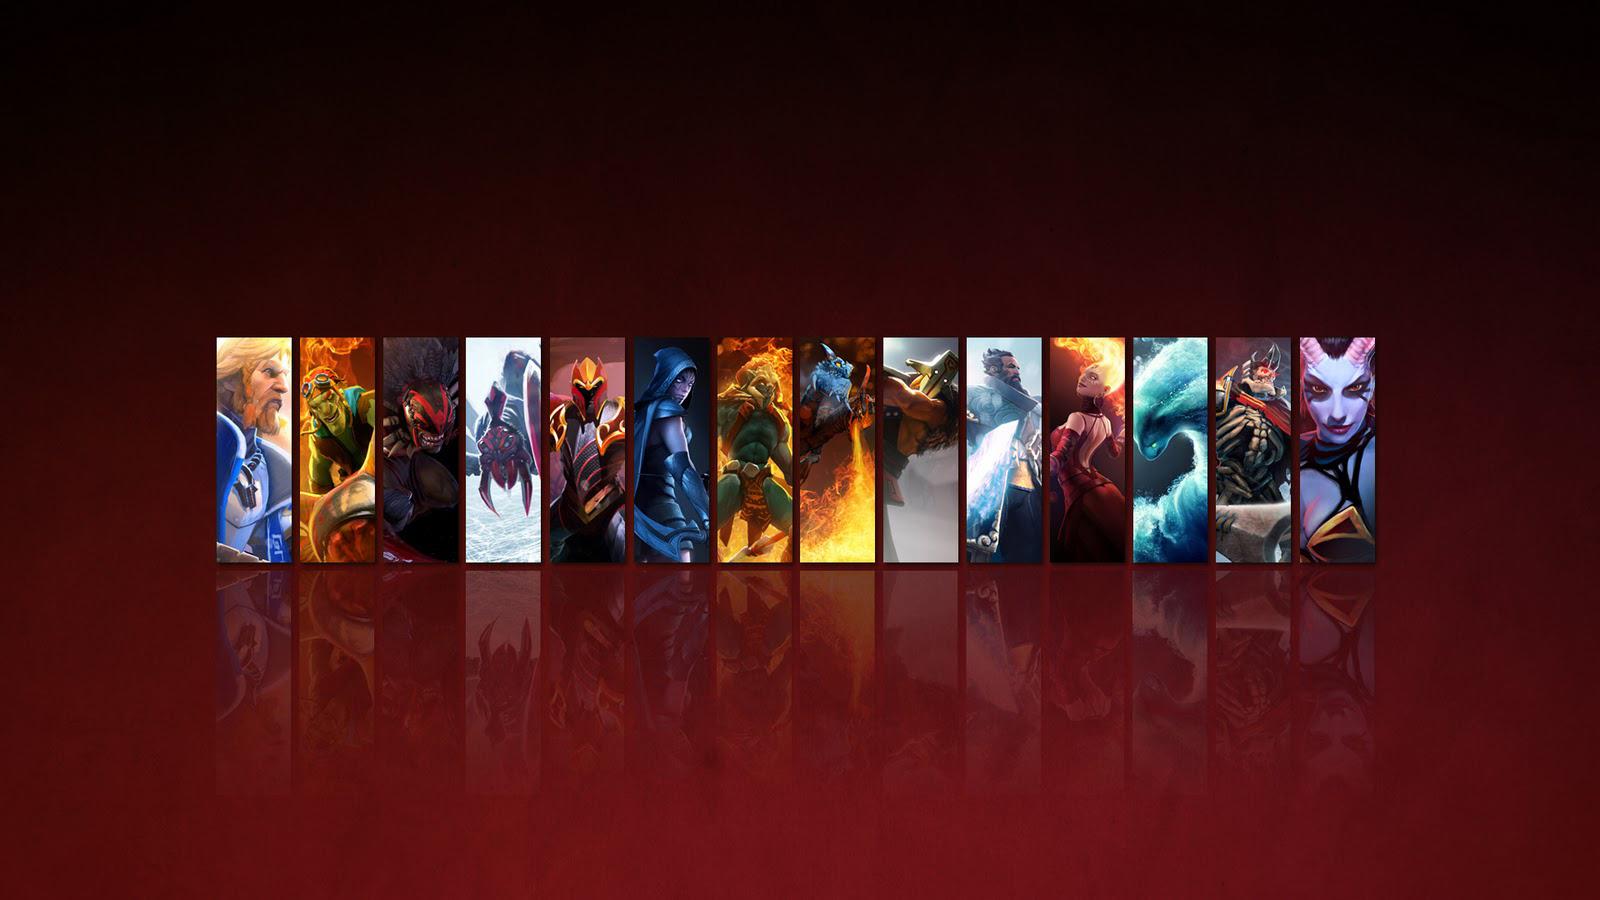 dota2_wallpaper_heroes_1600